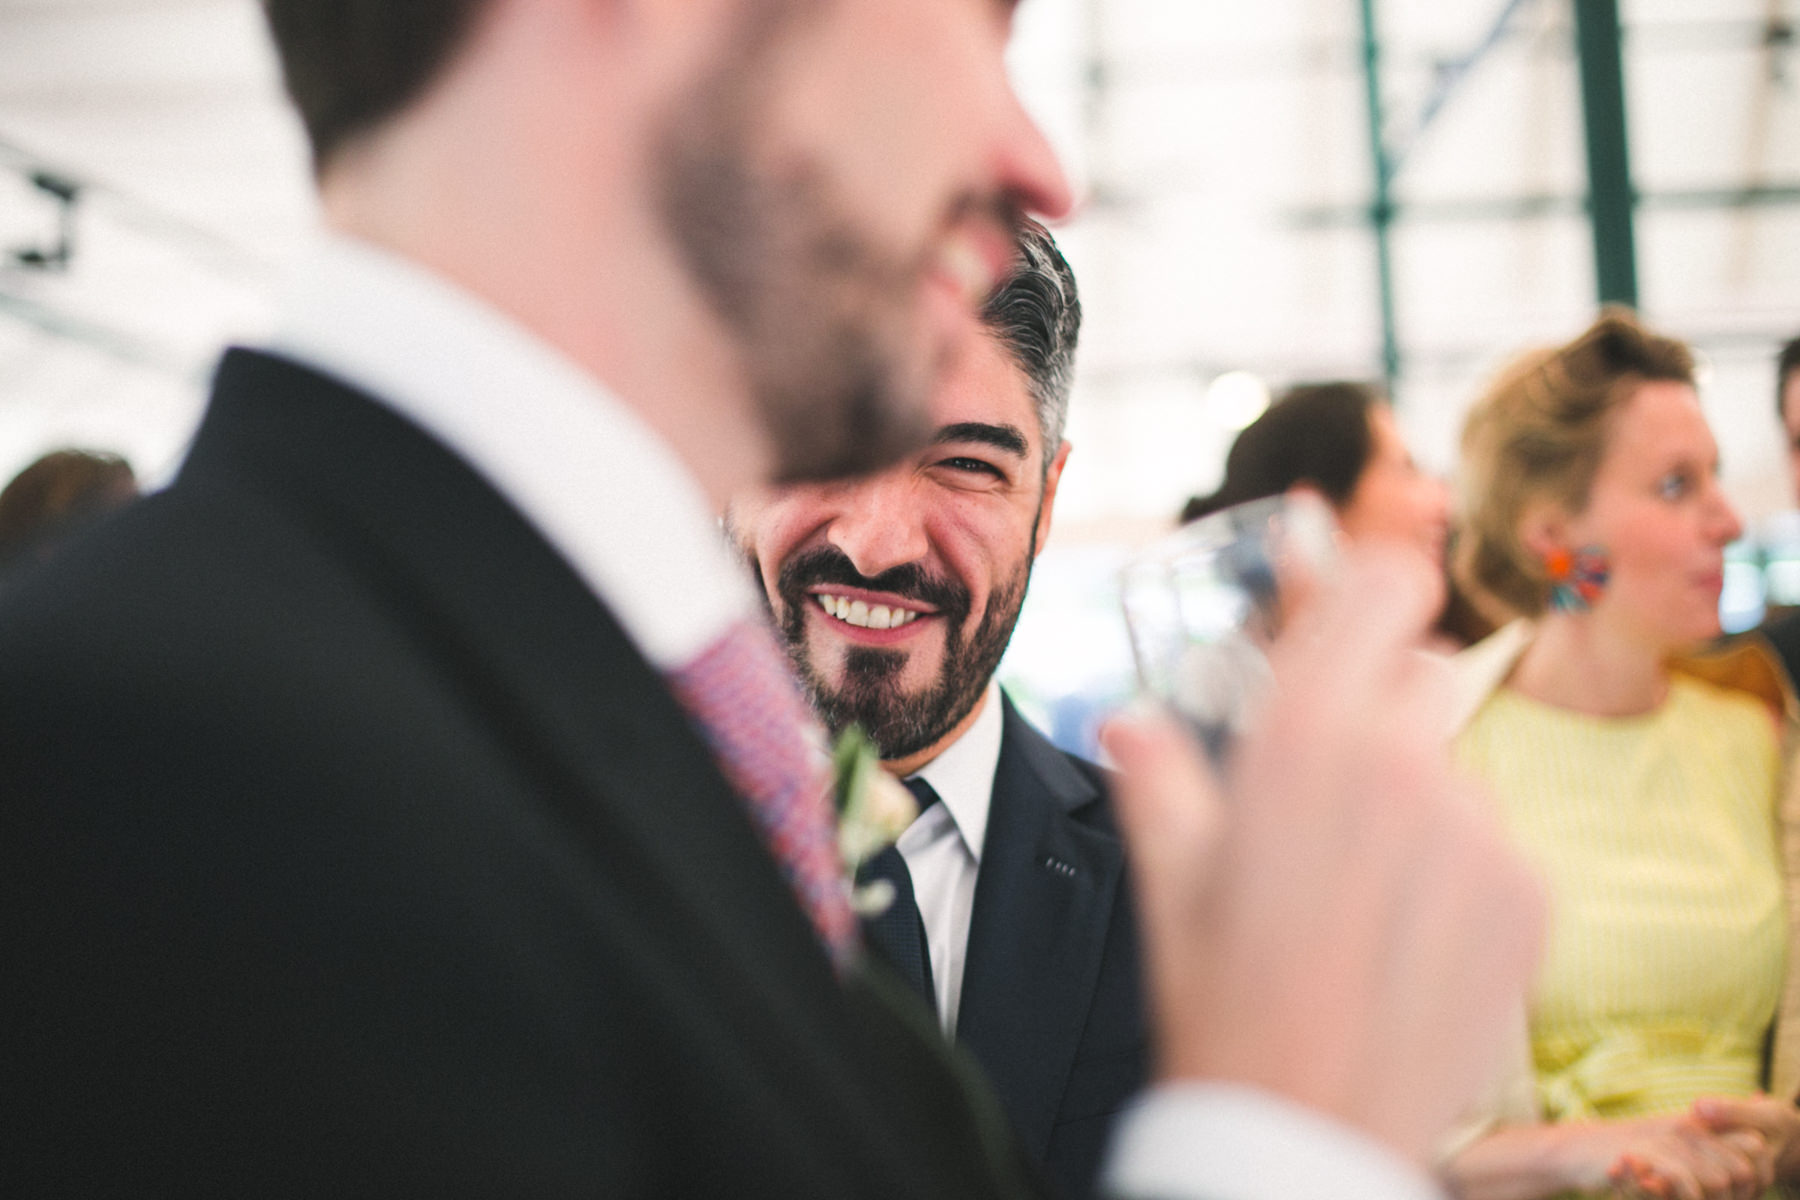 Wedding_Photography_Carlos_Hevia_Barcelona_Berlin_29.jpg